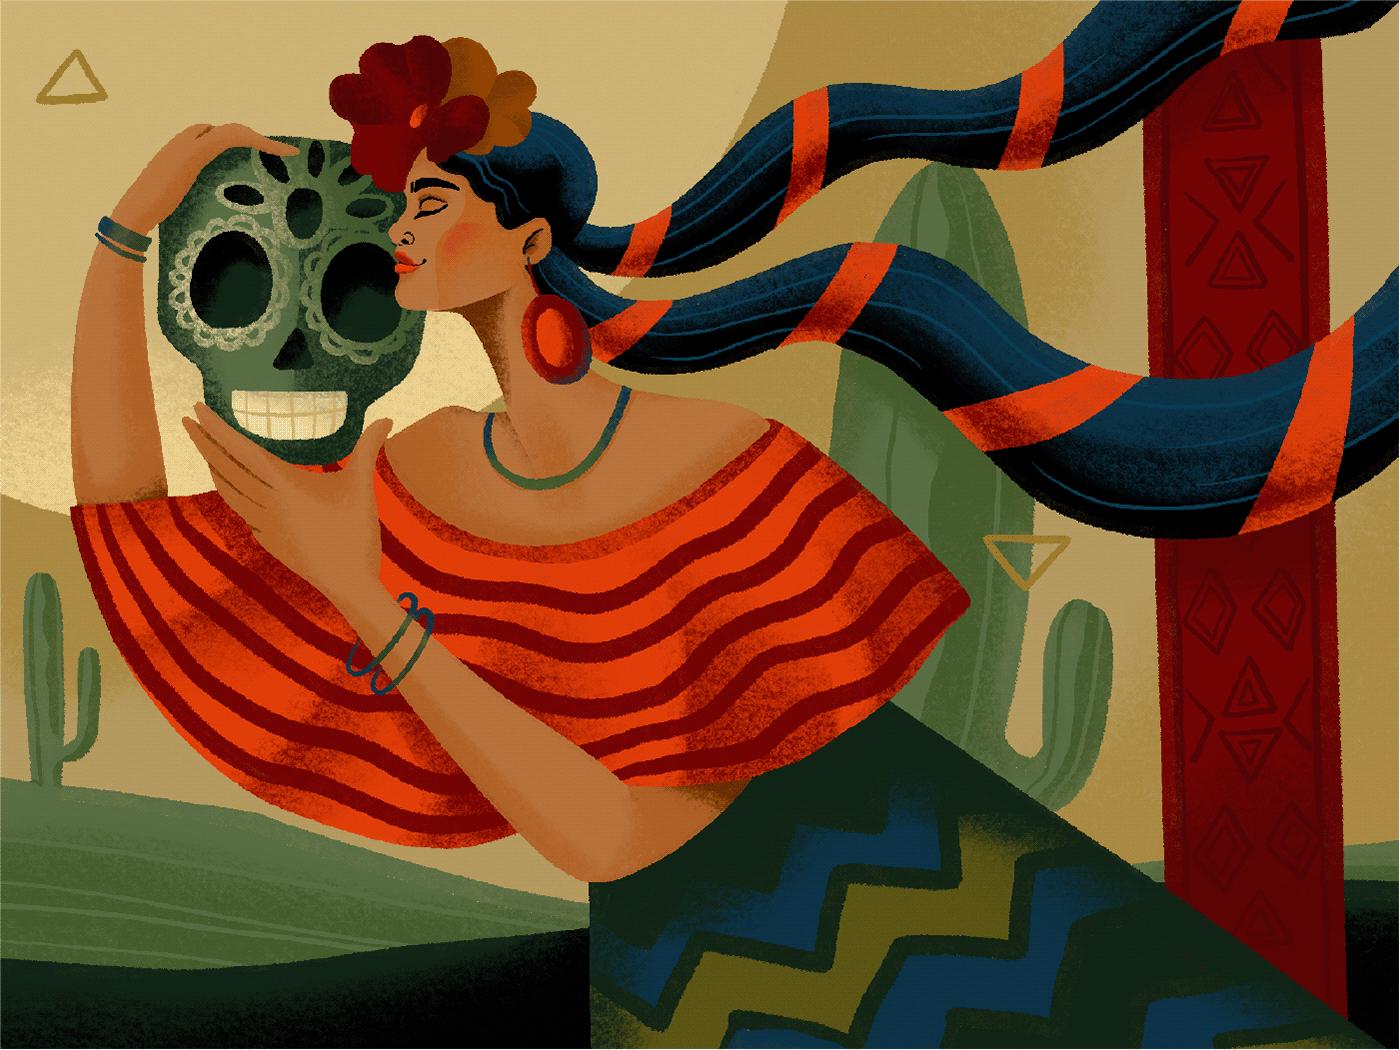 artwork costume countries digital illustration Diversity Ethnic nationality people women world